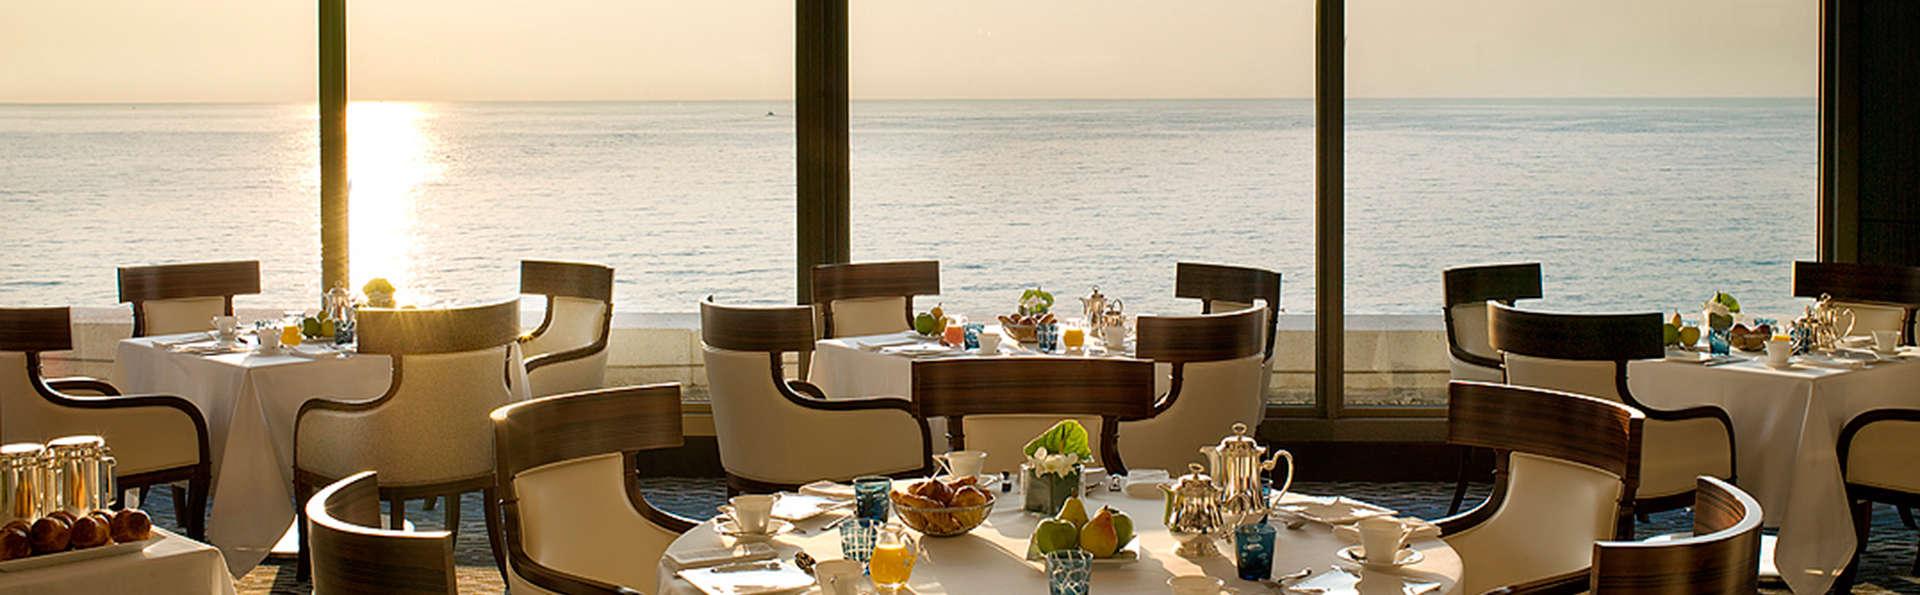 Fairmont Monte Carlo - EDIT_breakfast.jpg